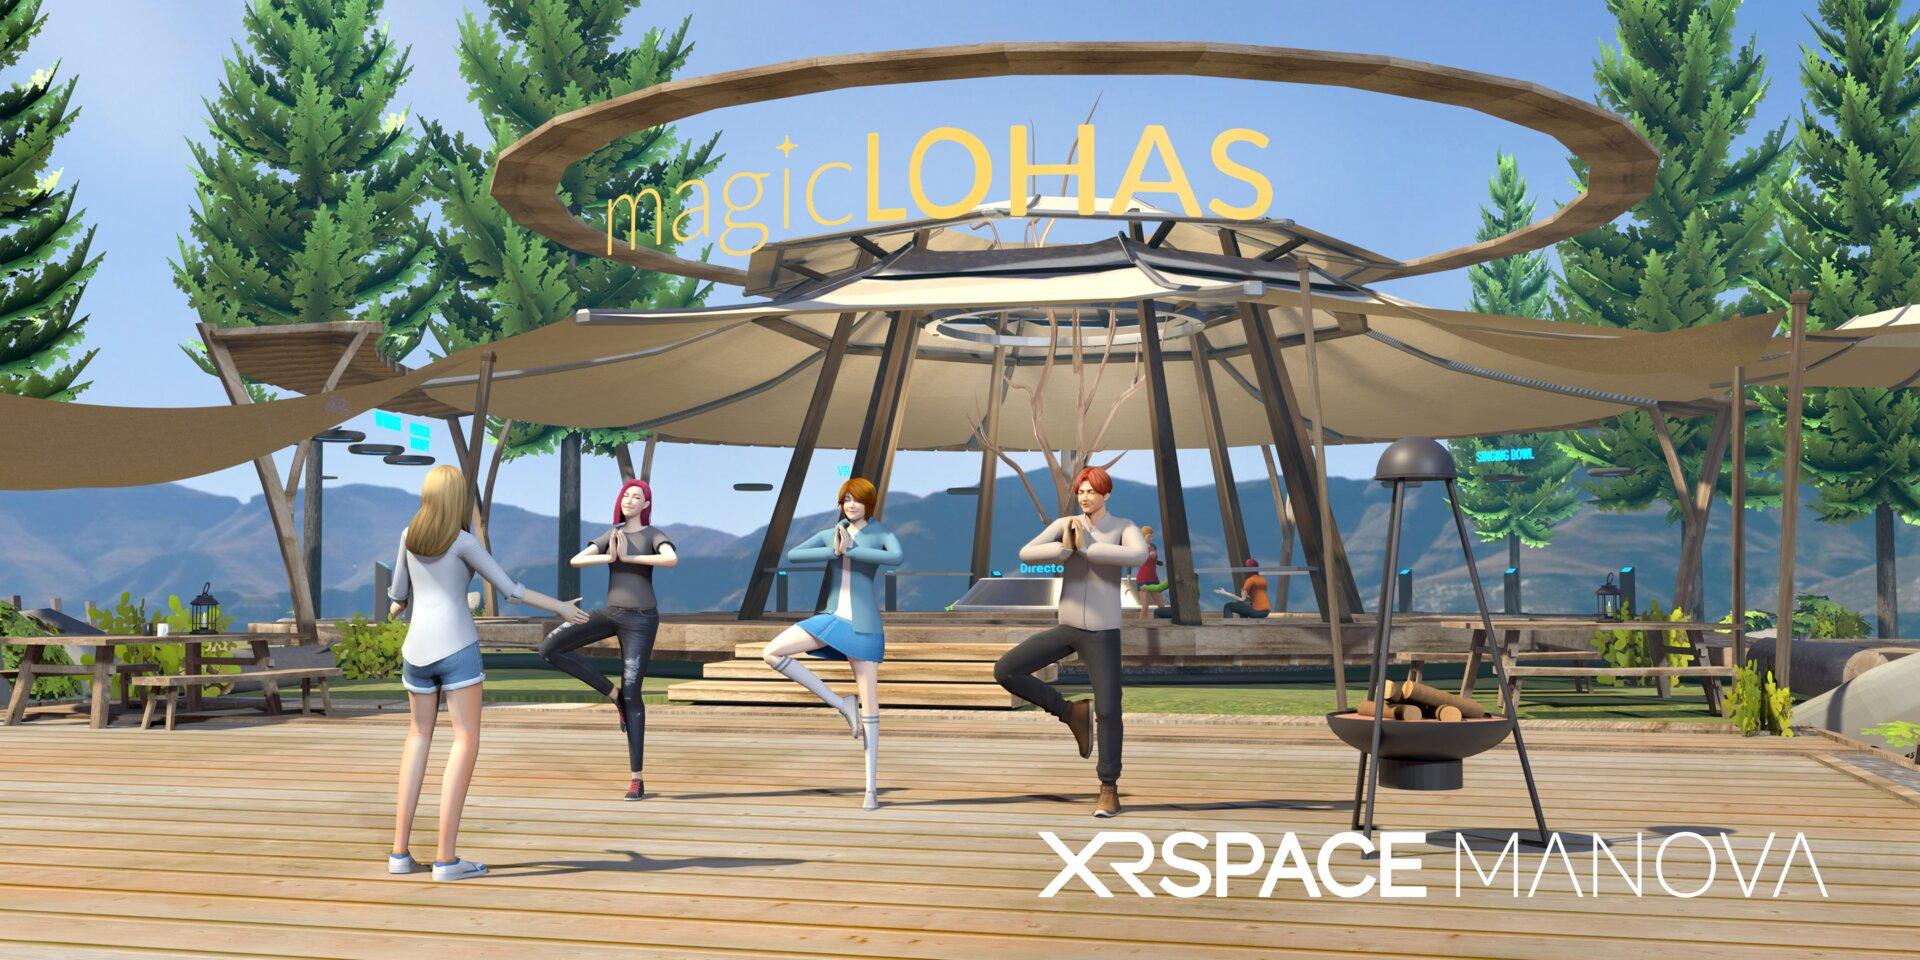 Yoga und Meditation in VR